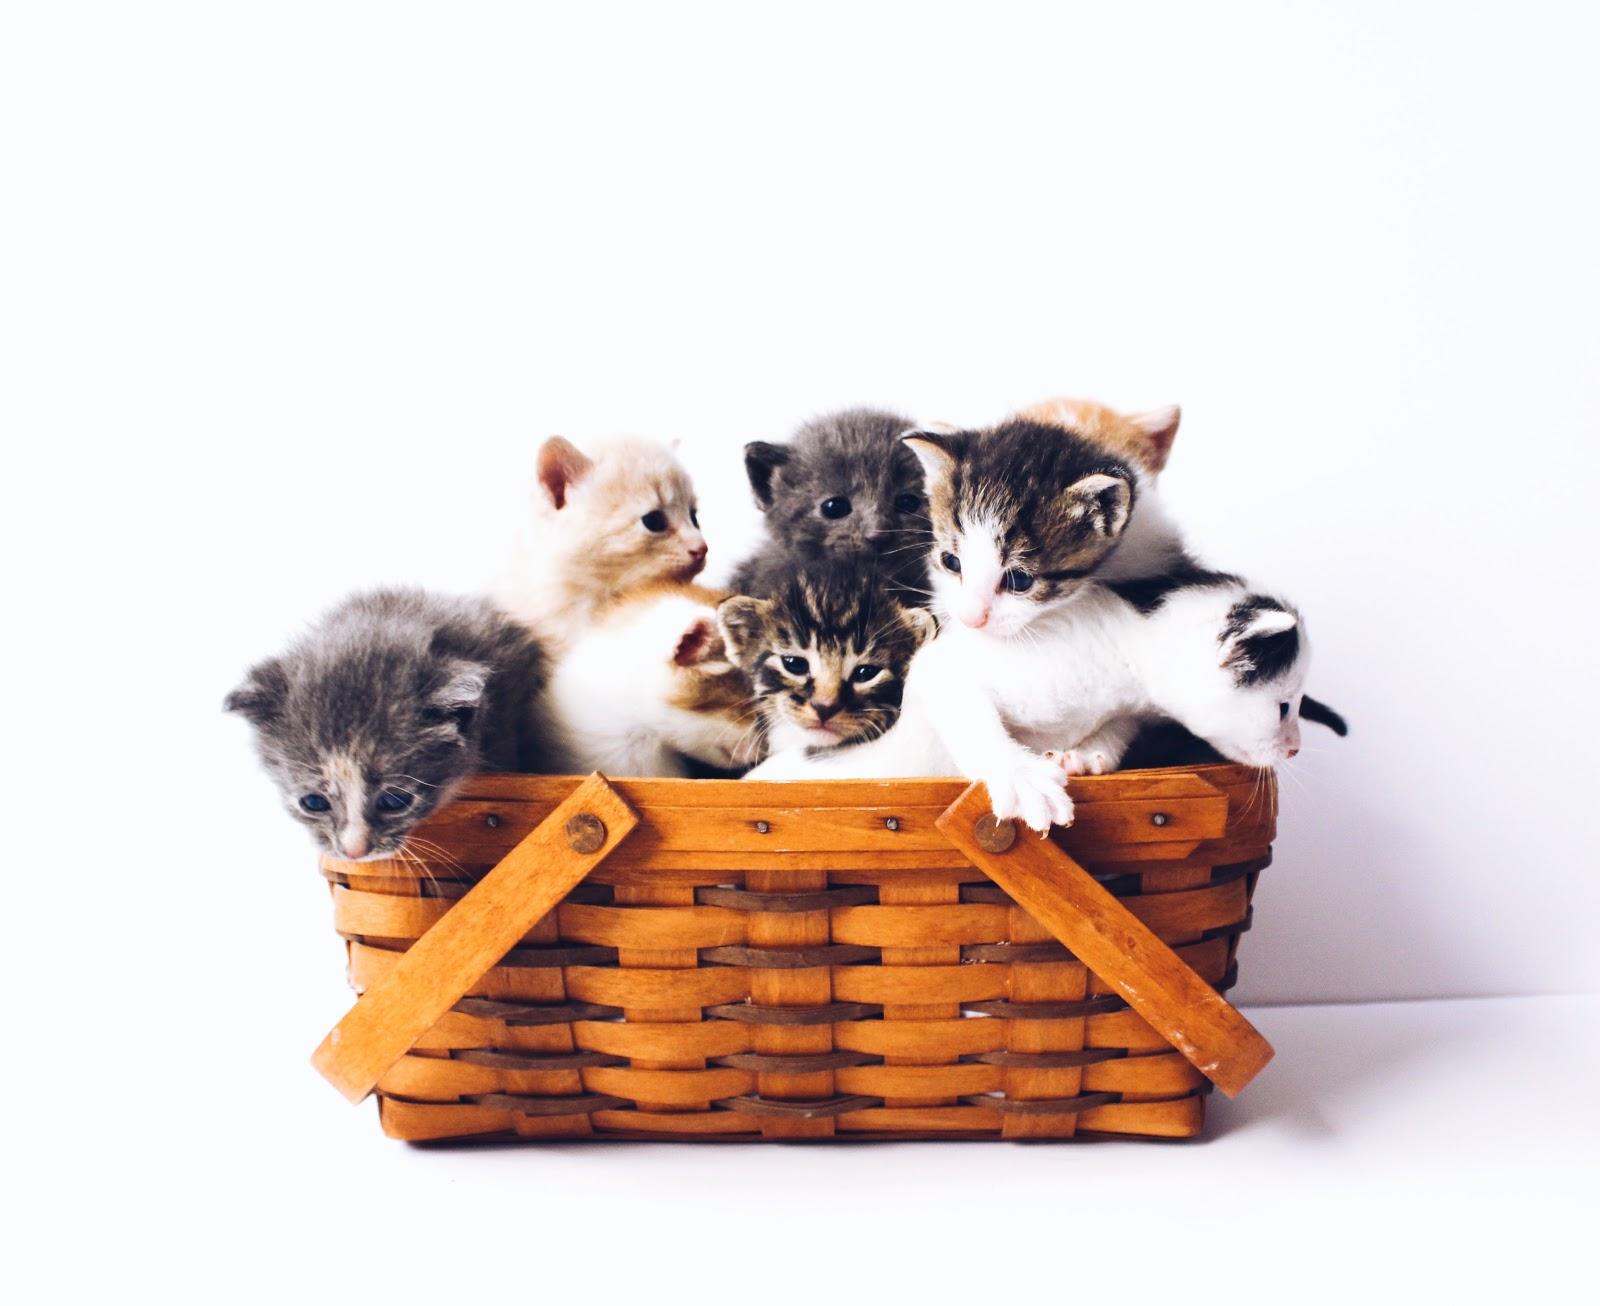 Trupanion pet health insurance